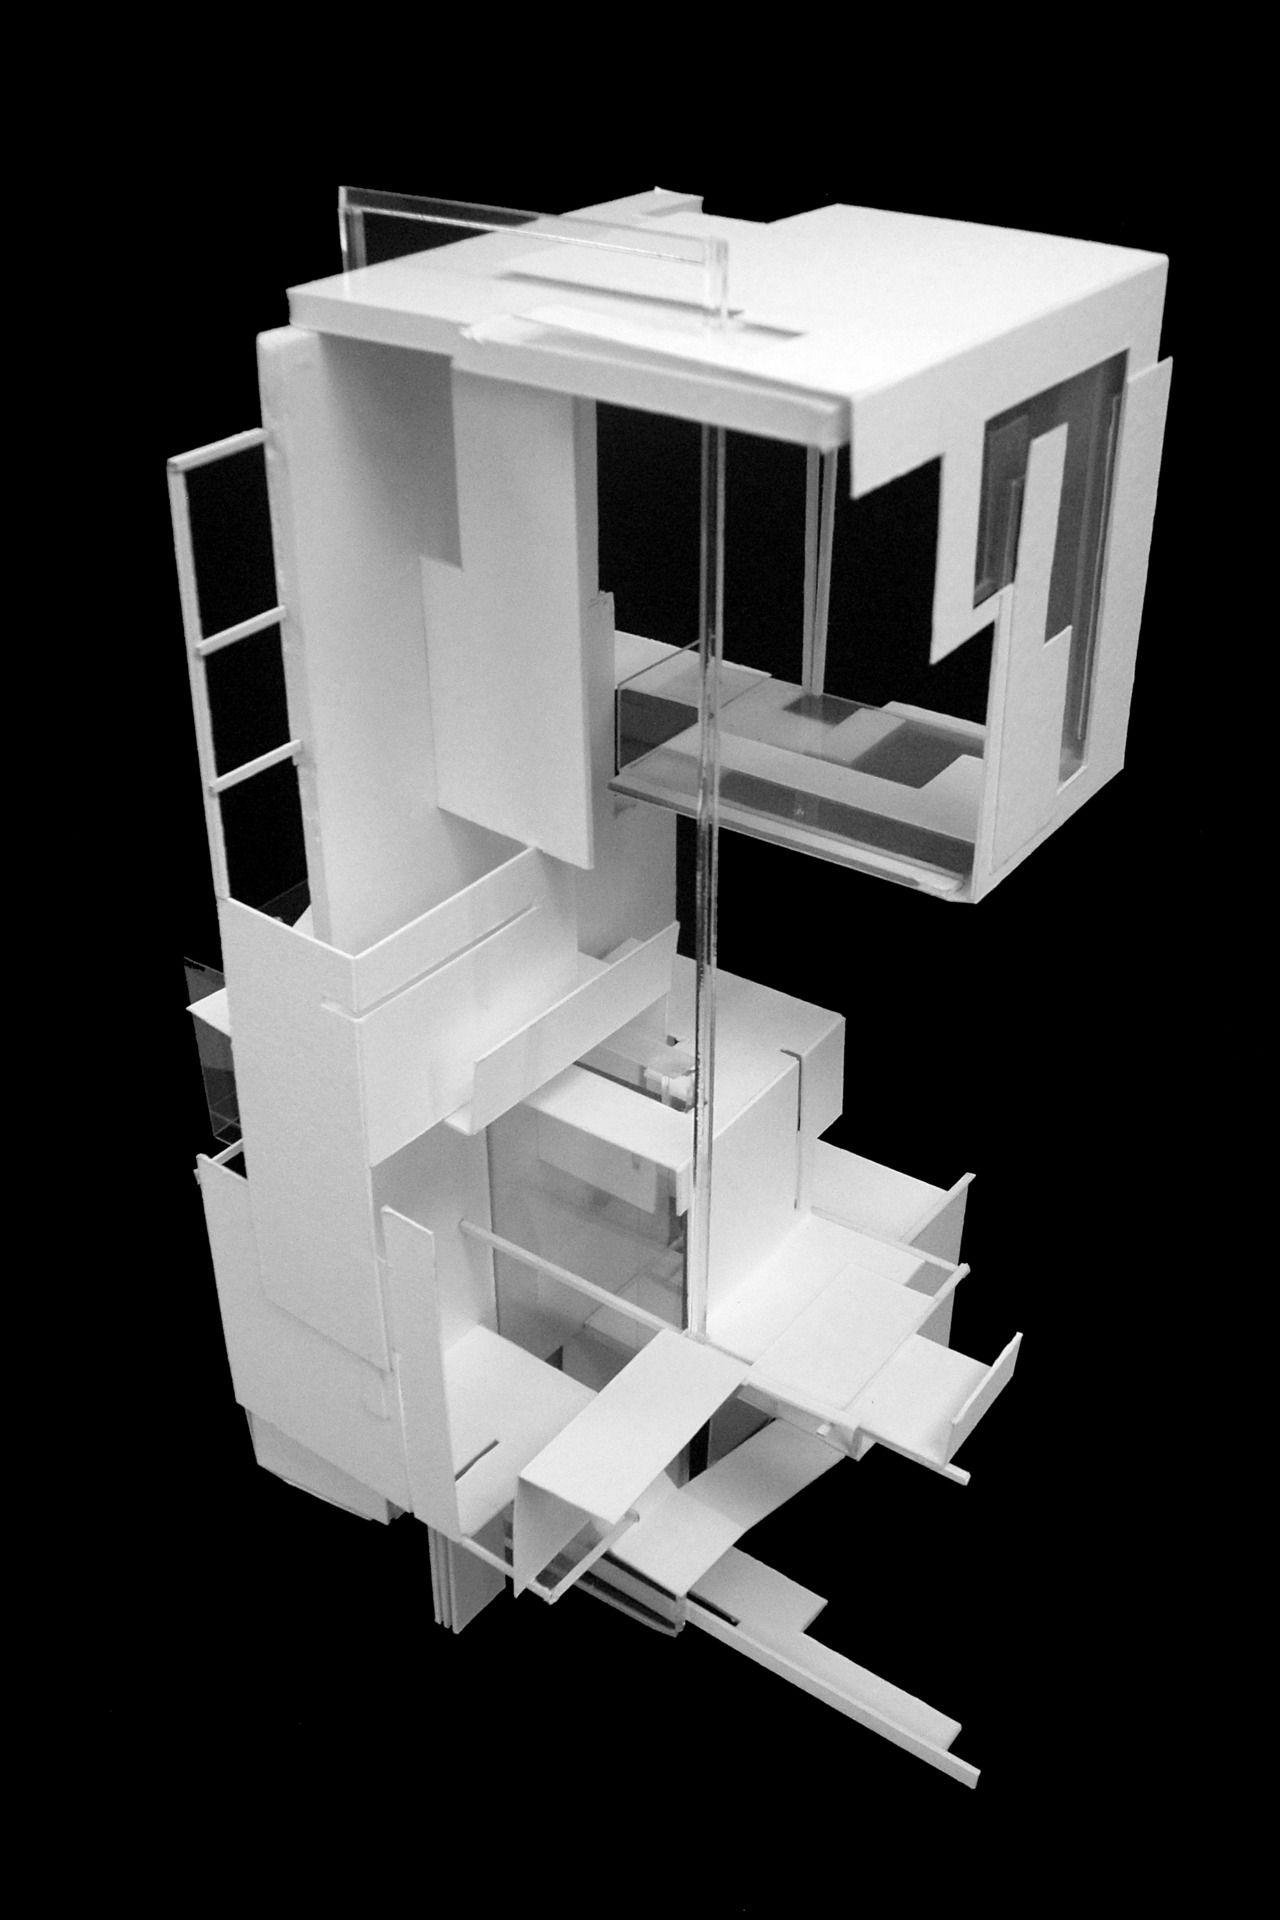 tectonic architecture design